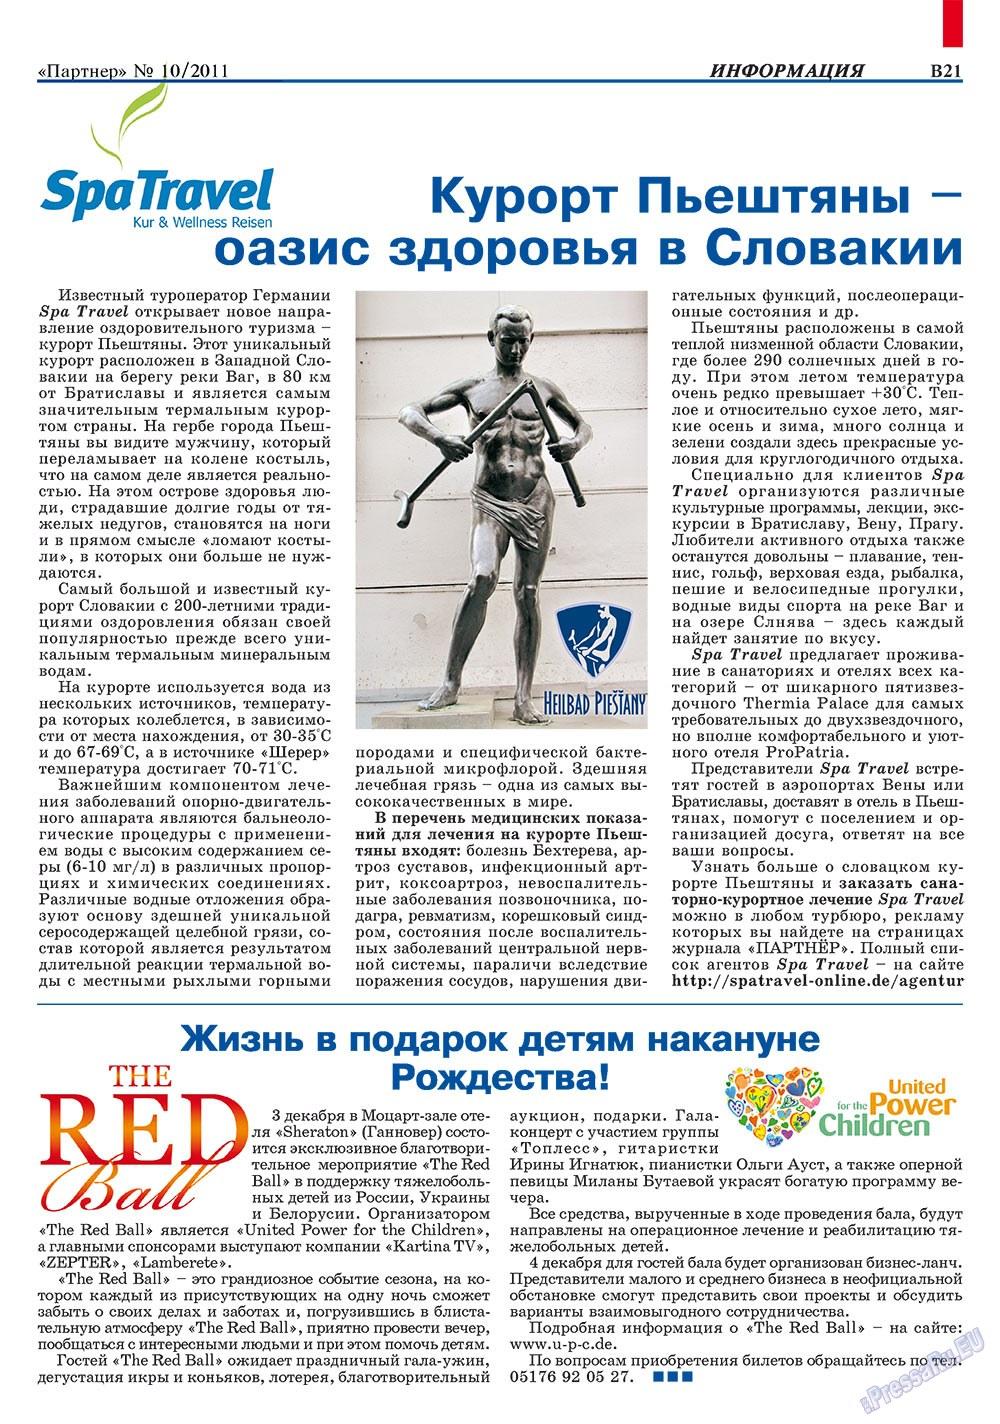 Партнер-север (журнал). 2011 год, номер 10, стр. 31